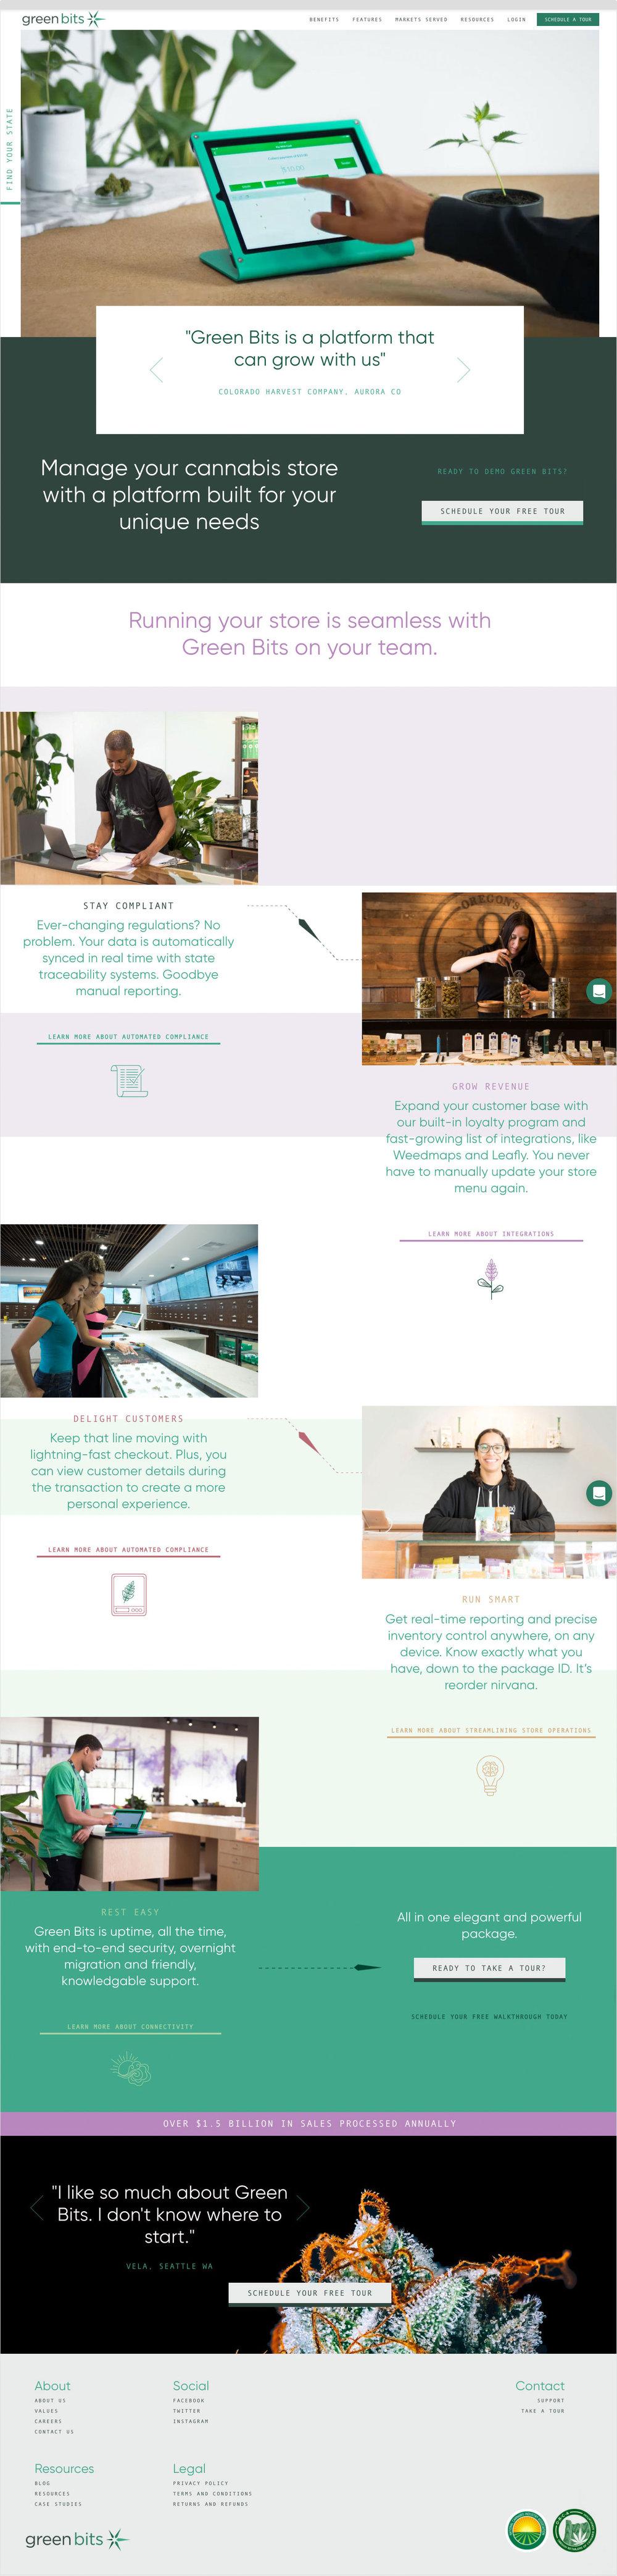 The_Beauty_Shop_Green_Bits_Website_2.jpg